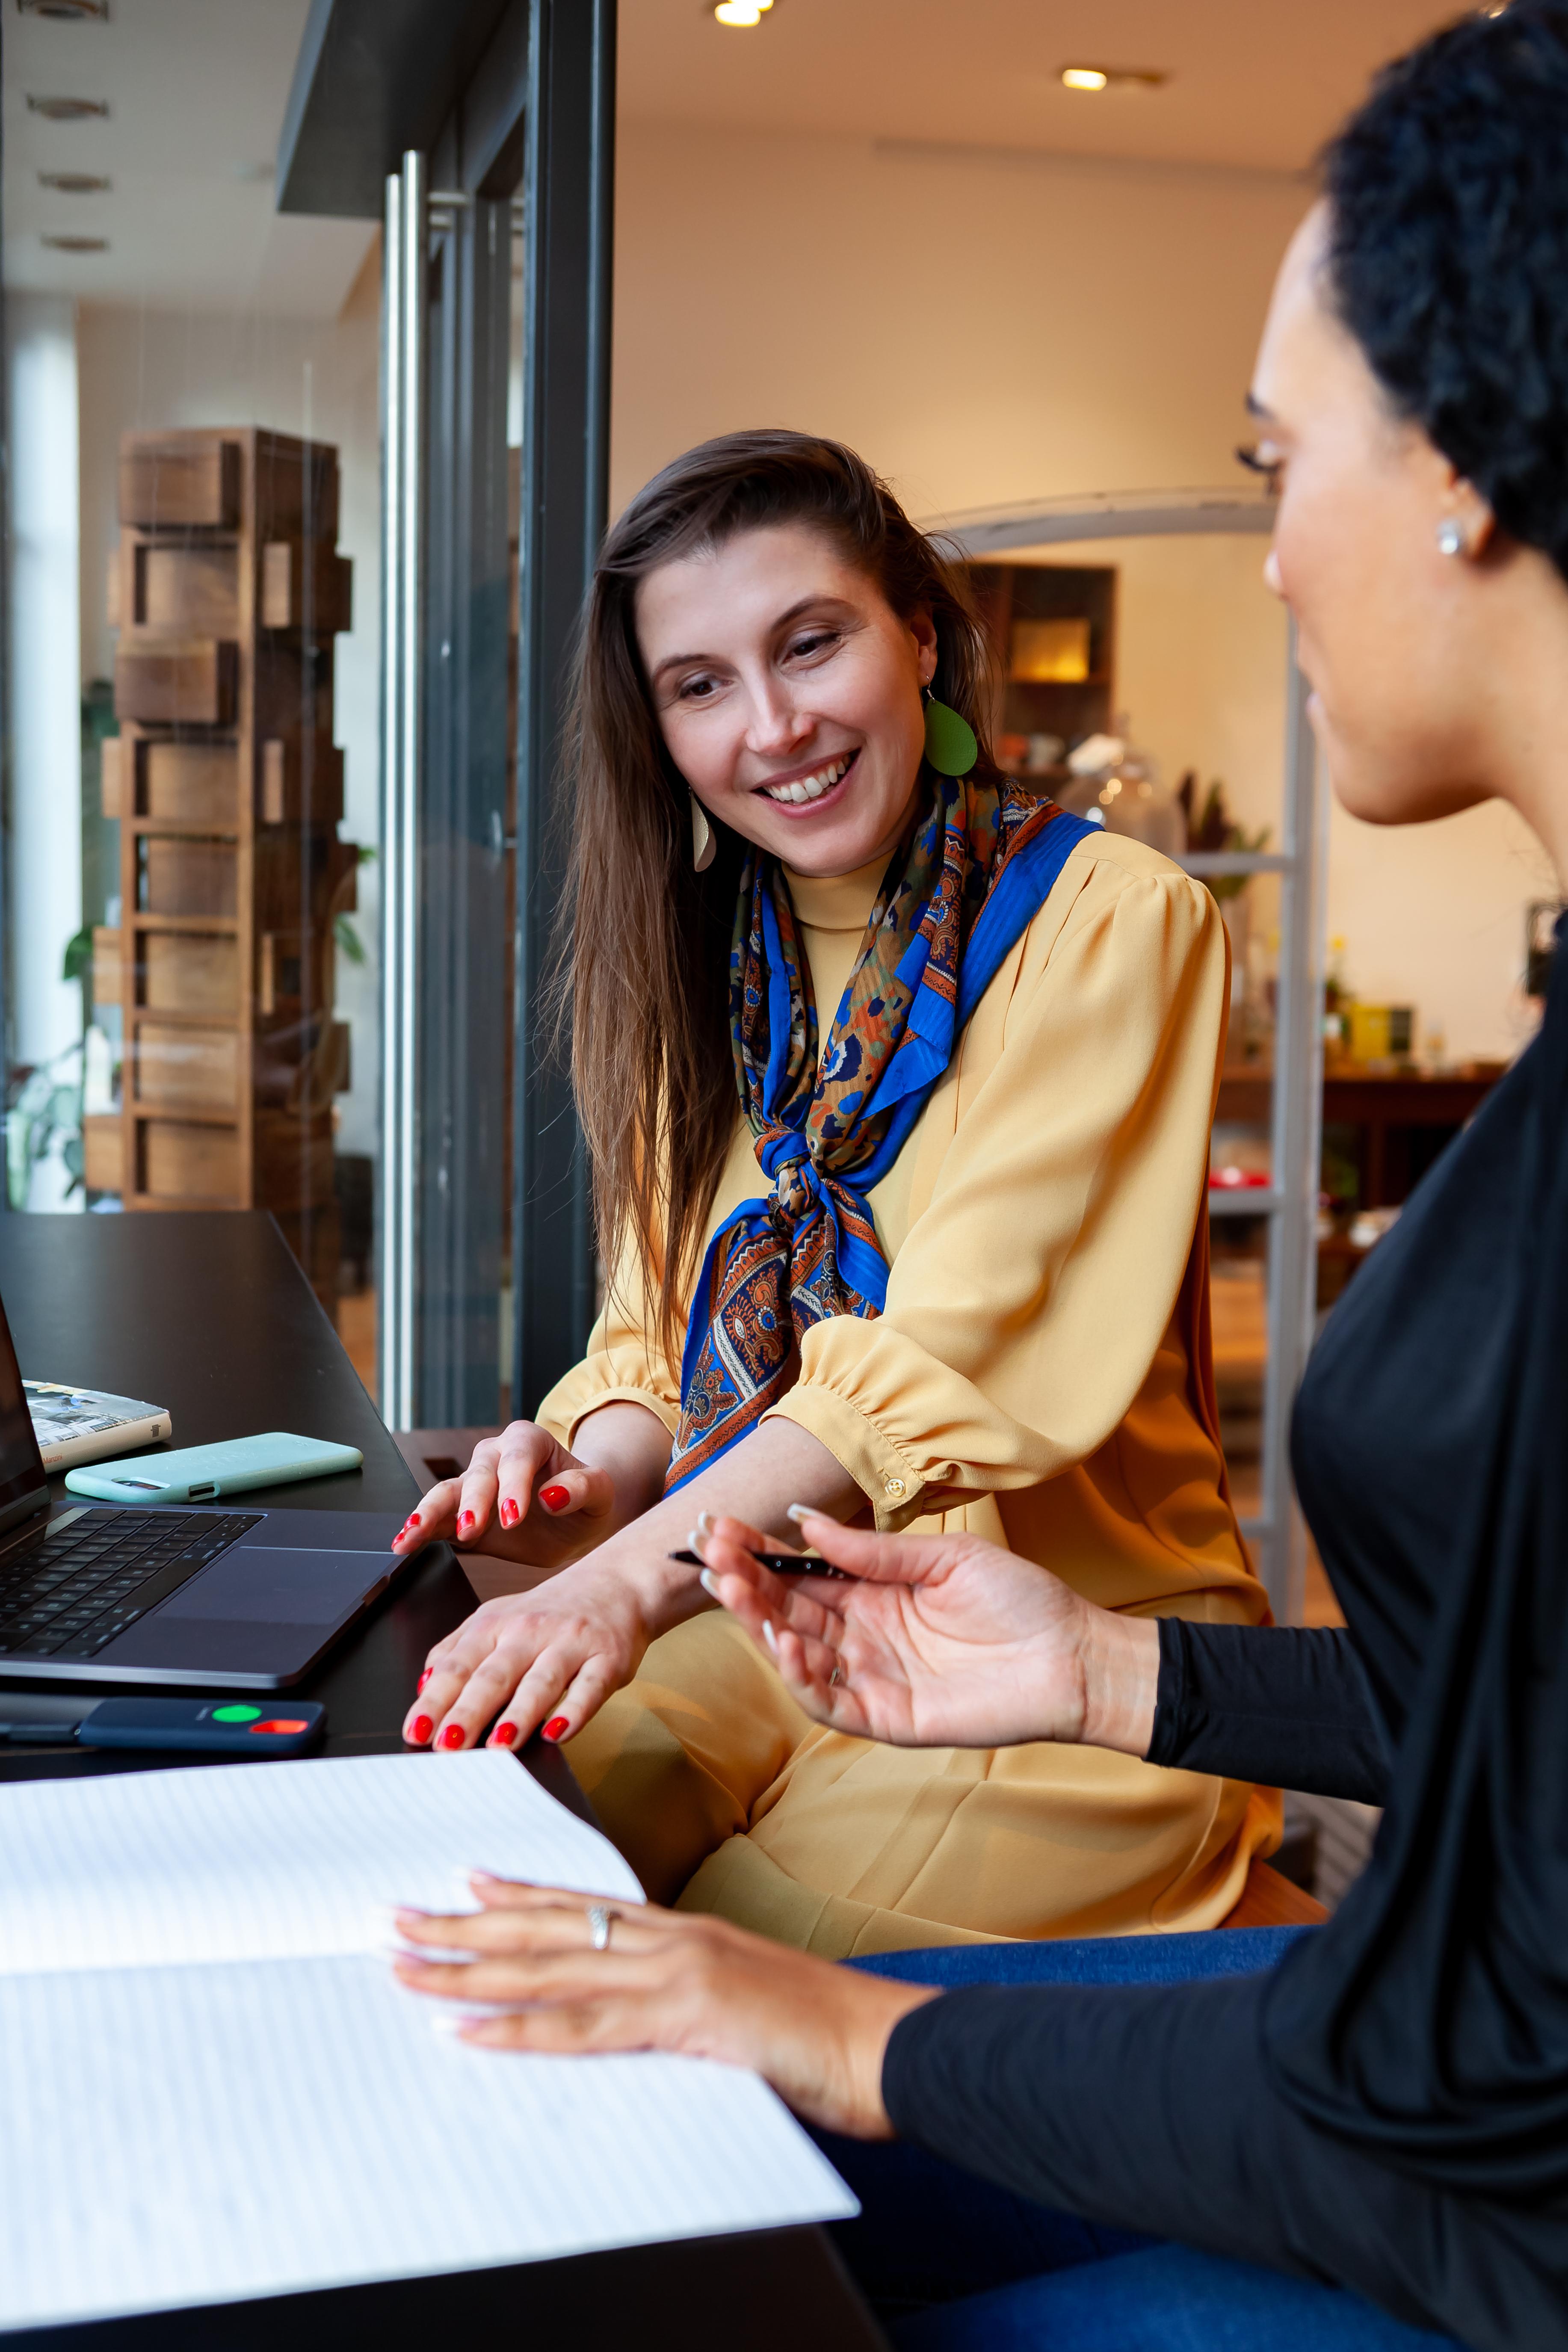 Rachel Sheila Kan giving fashion start-up consultancy advice